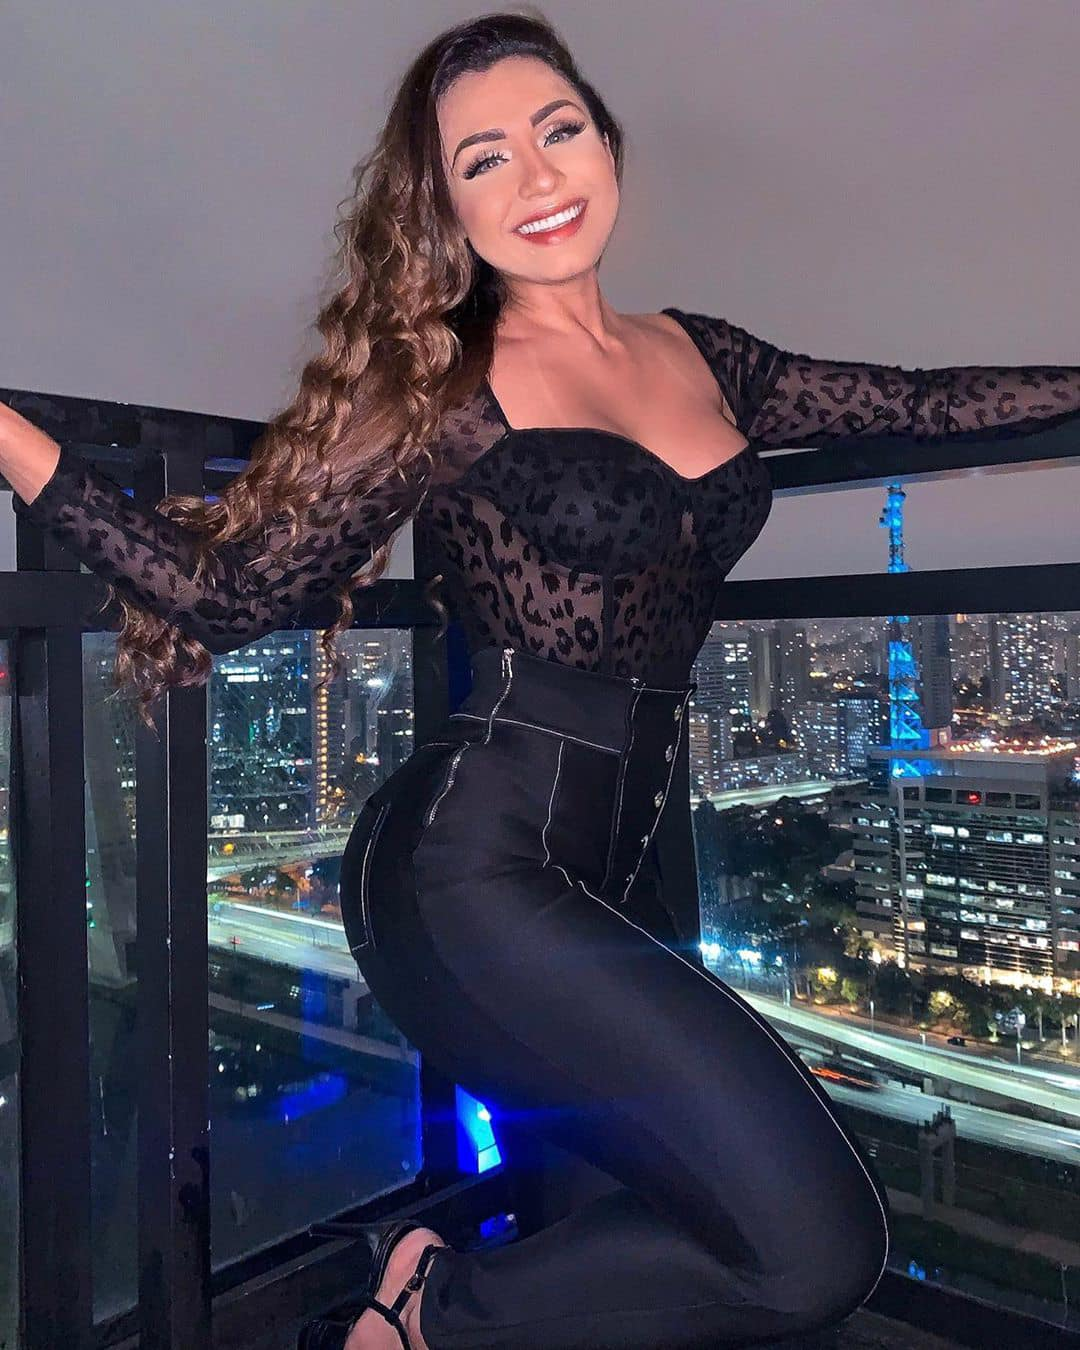 Isabelle Araujo AM Manaus Bella -  seg p